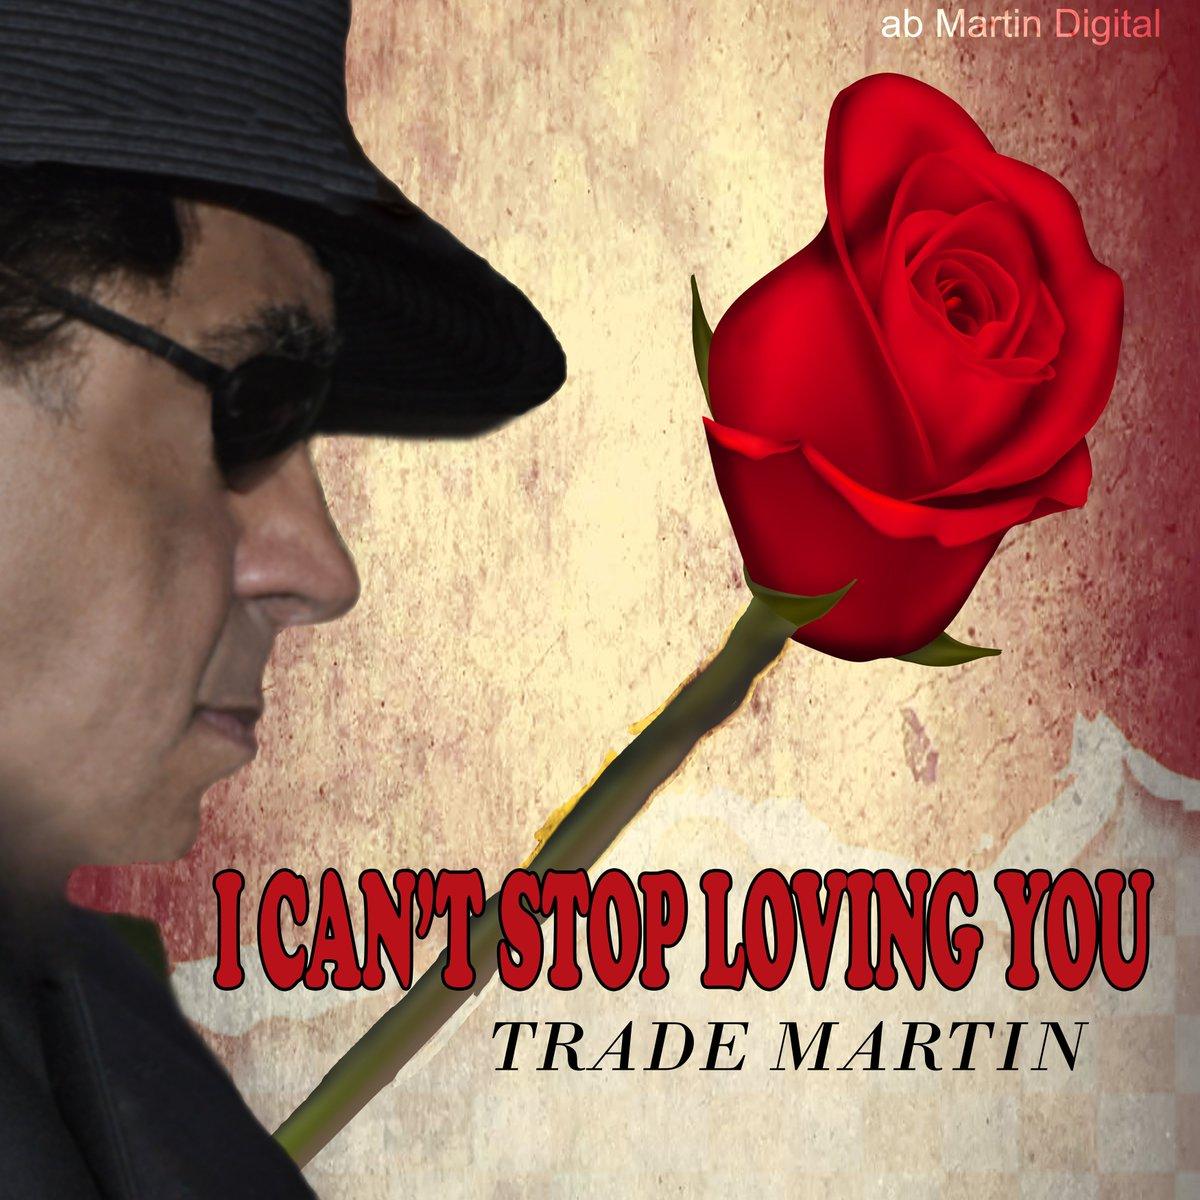 I Can't Stop Loving You https://www.youtube.com/watch?v=oQtBBojBkEA… #TradeMartin #abMartinDigital #Amazon #Pandora #AppleMusic #Spotify